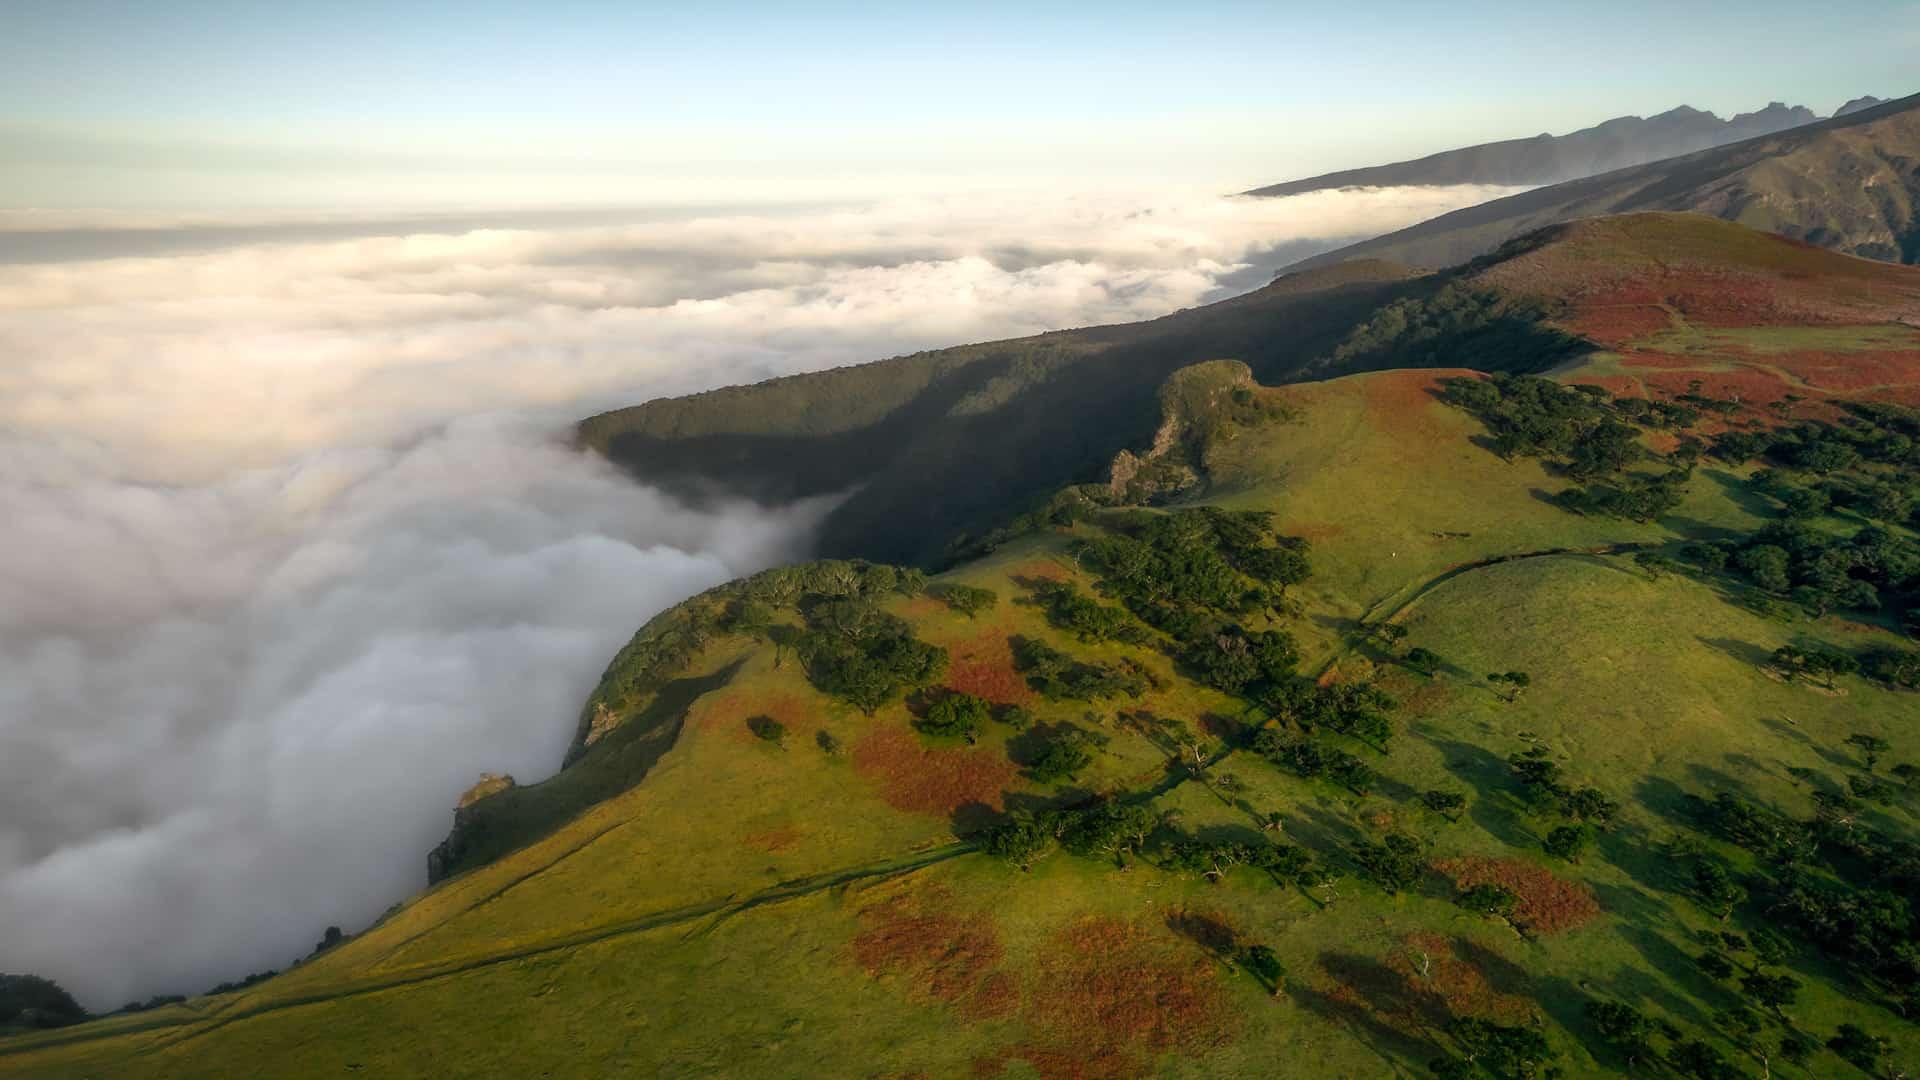 fanal-forest-vereda-drone-slider